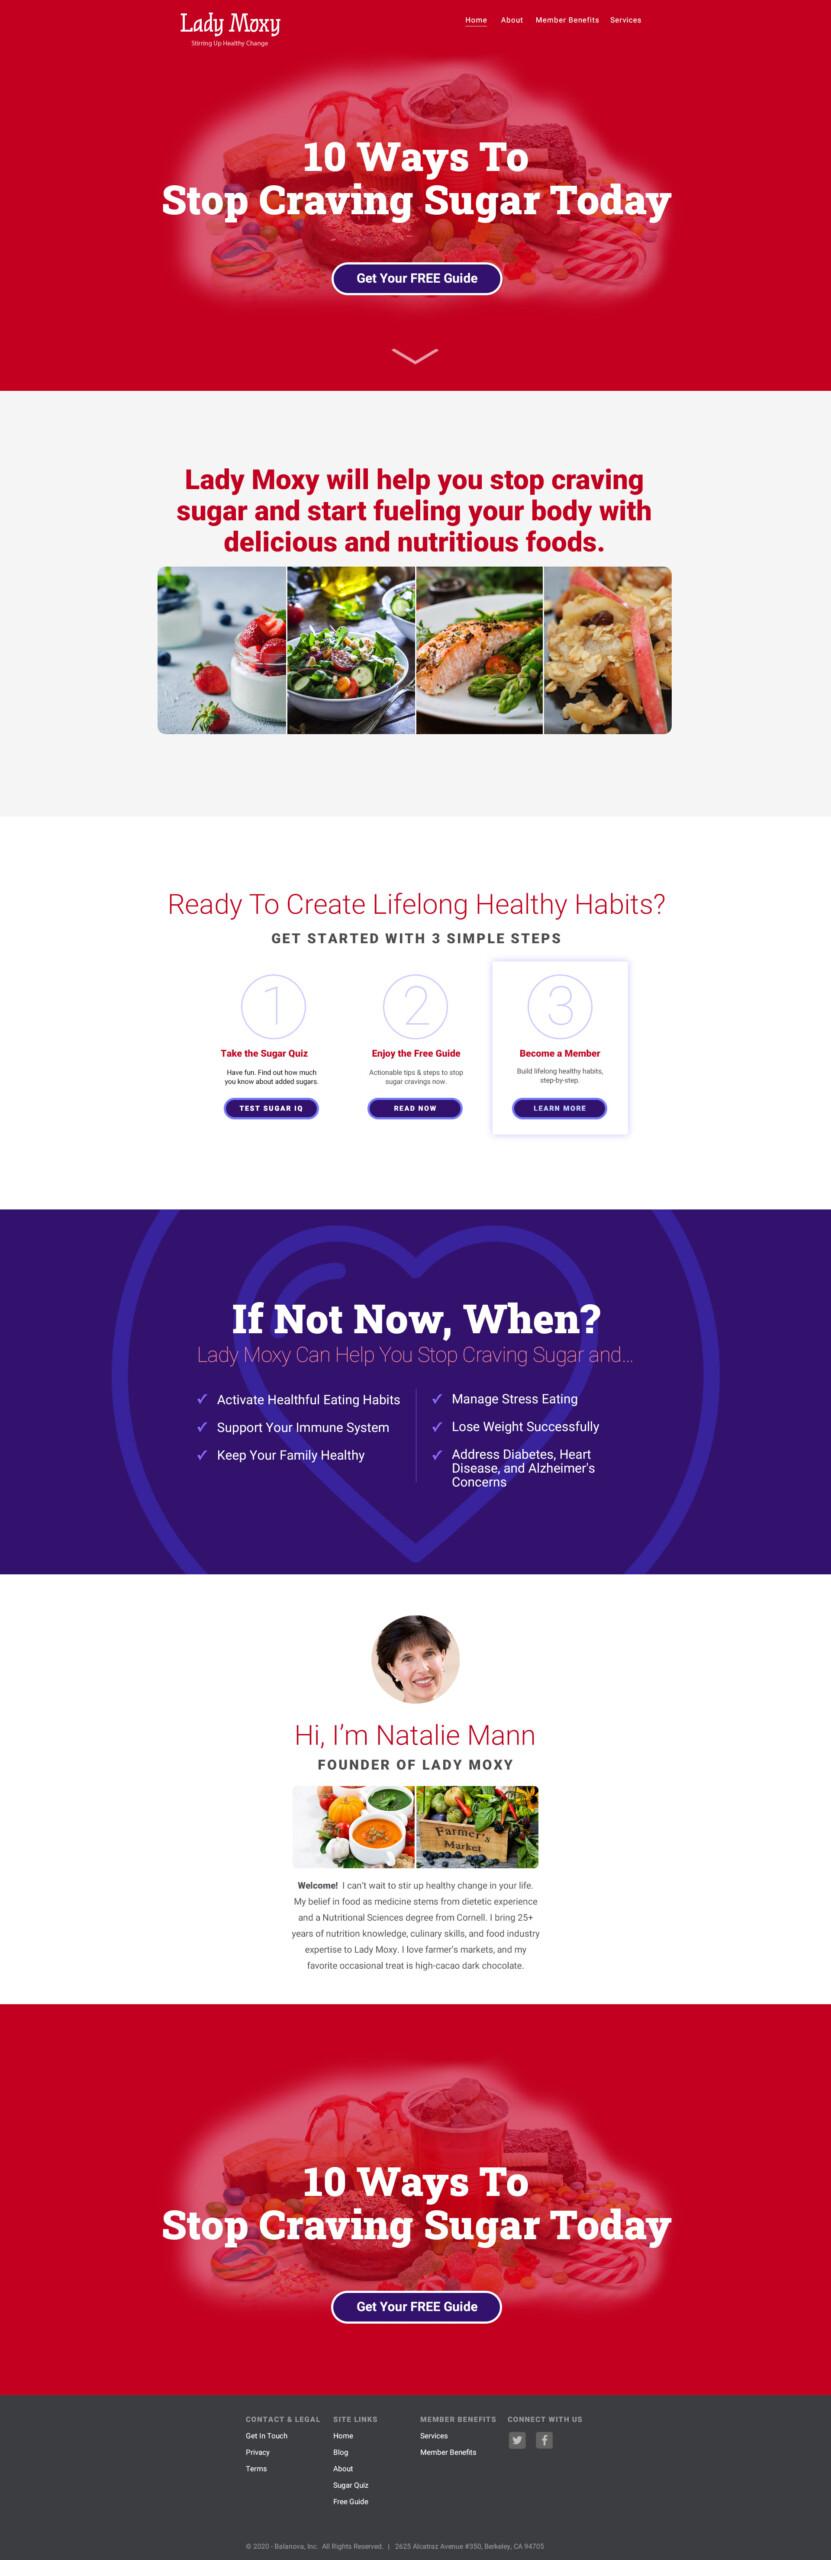 ladymoxy wordpress website design